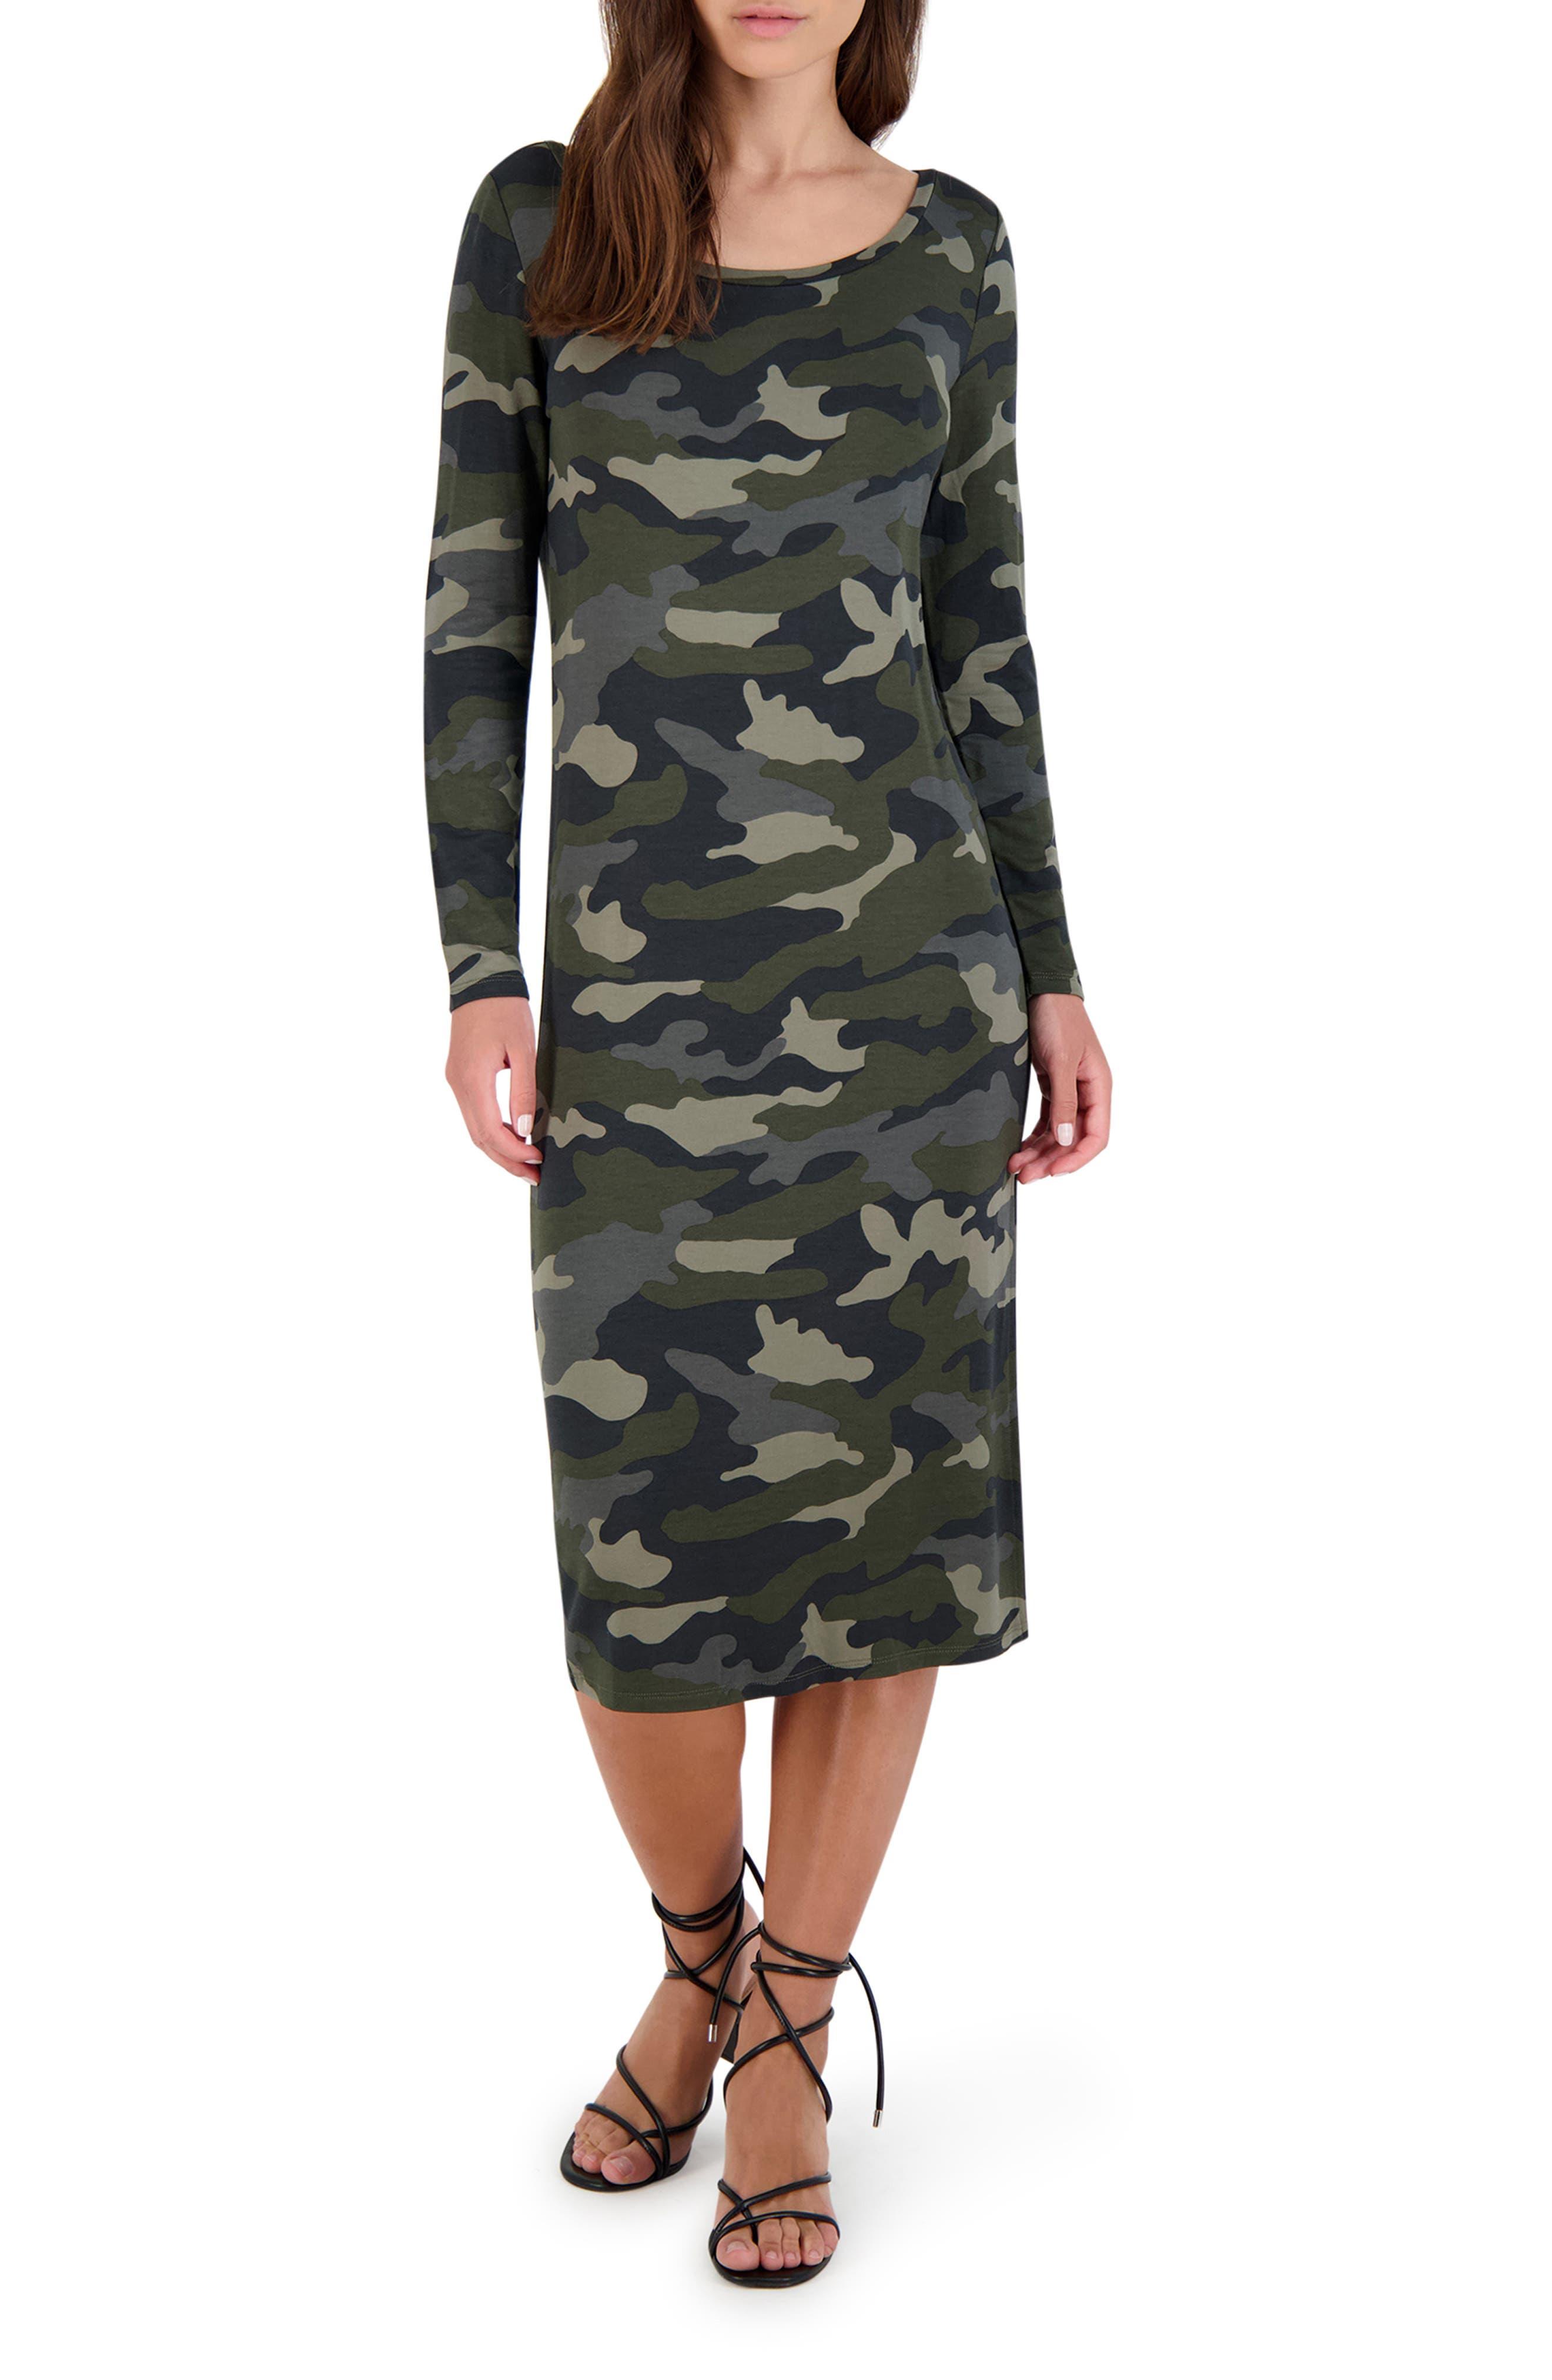 Shirt Dresses For Womens Sleeveless Halter Neck Boho Print Casual Mini Beachwear Dress Sundress For Anniversary,Party,Valentines Day Navy,S